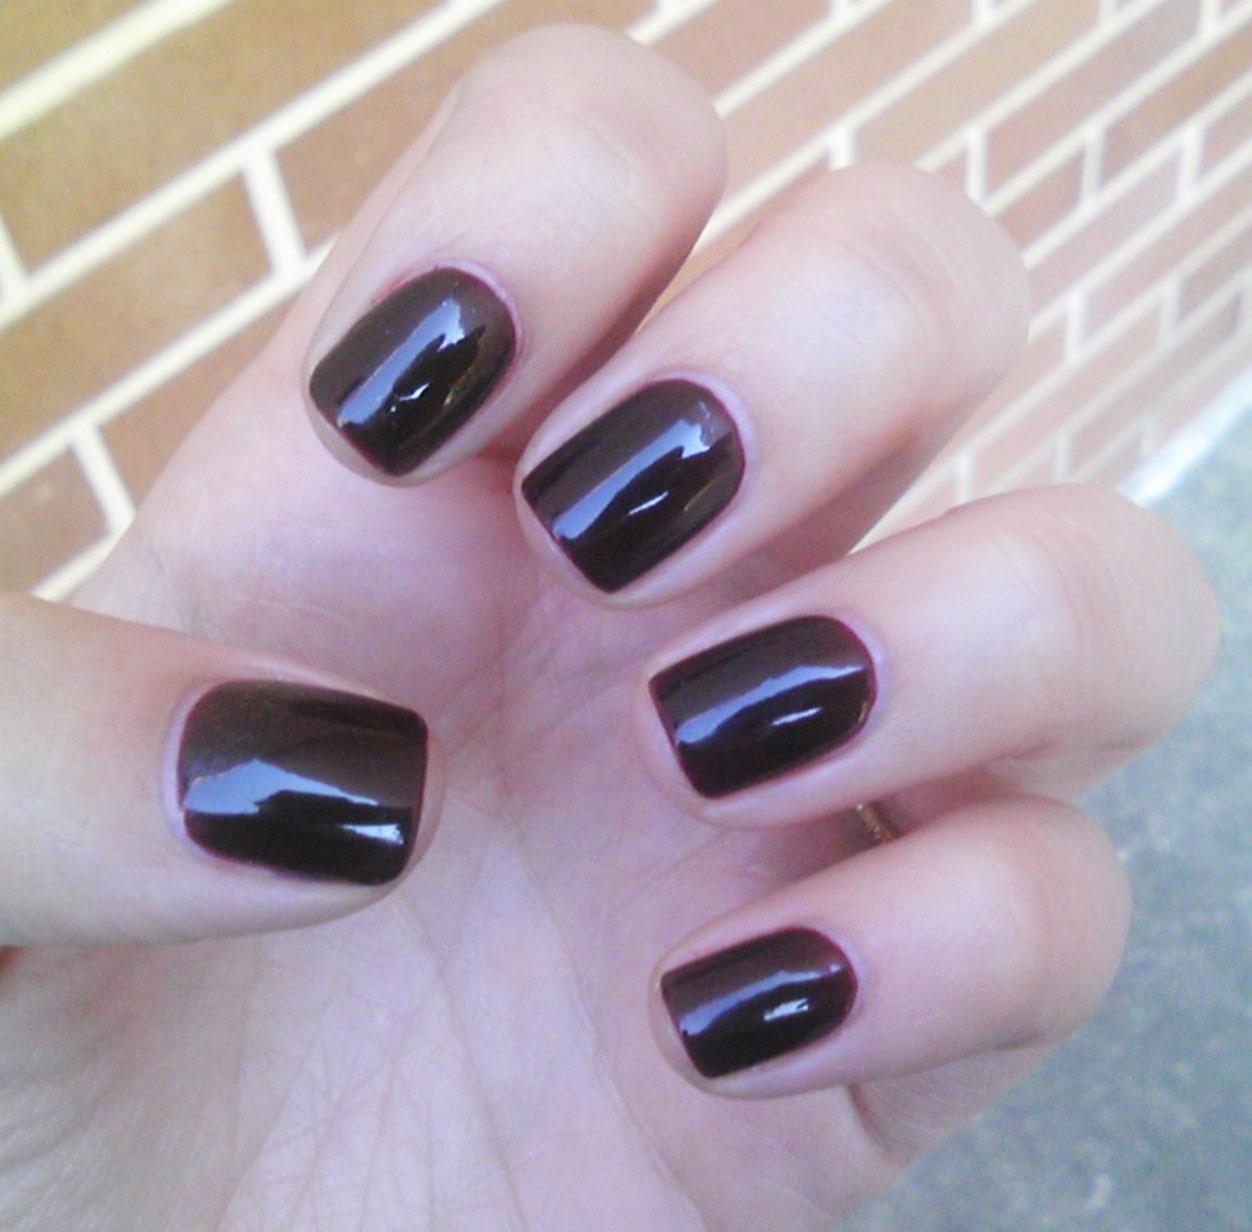 Polish or Perish: Vamp Jelly - Essie Material Girl